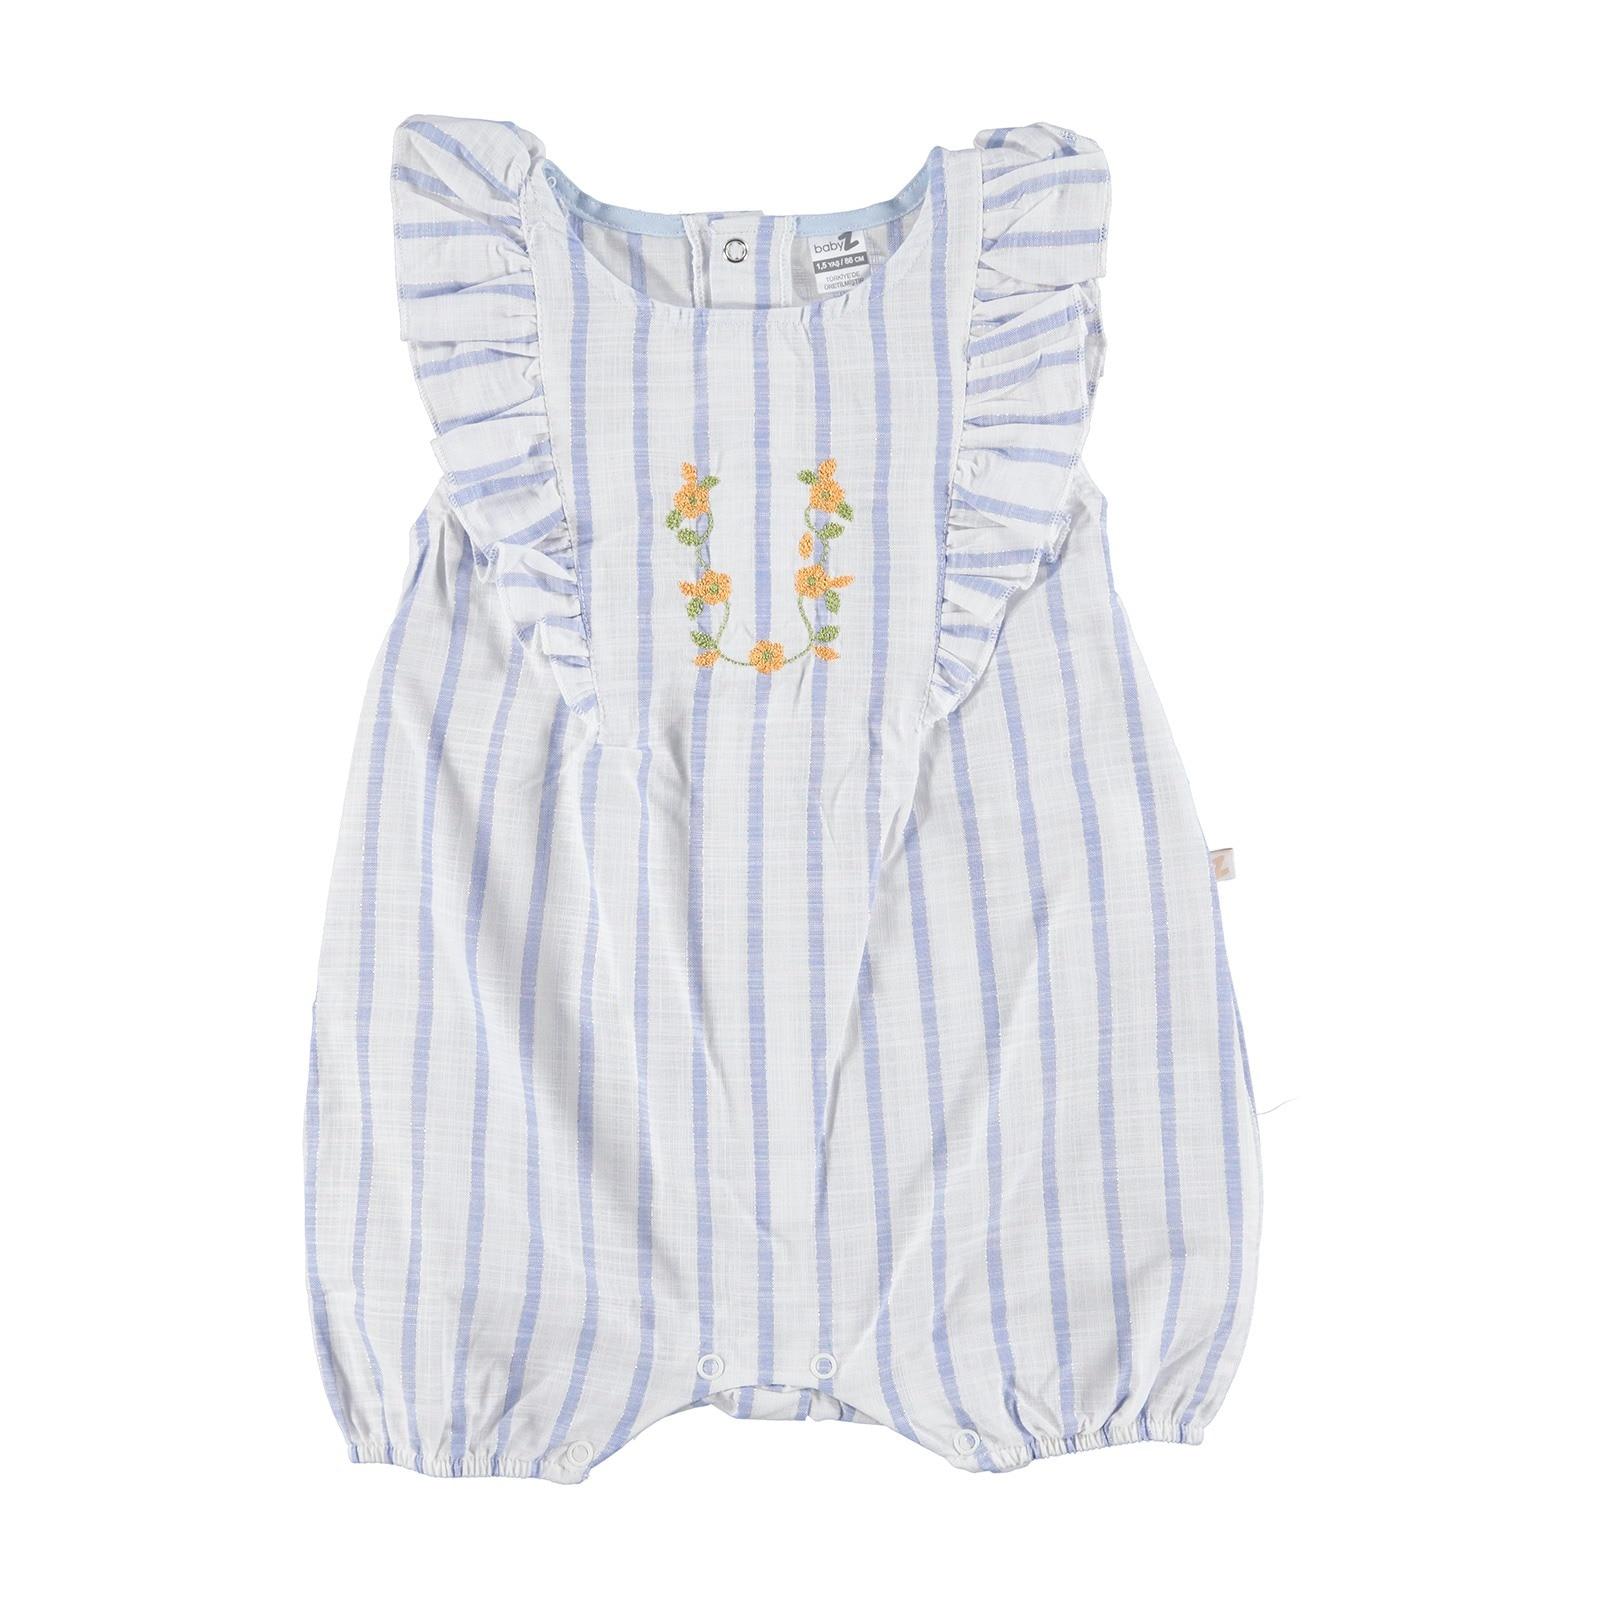 Ebebek BabyZ Star Embroidered Texture Baby Girl Short Romper